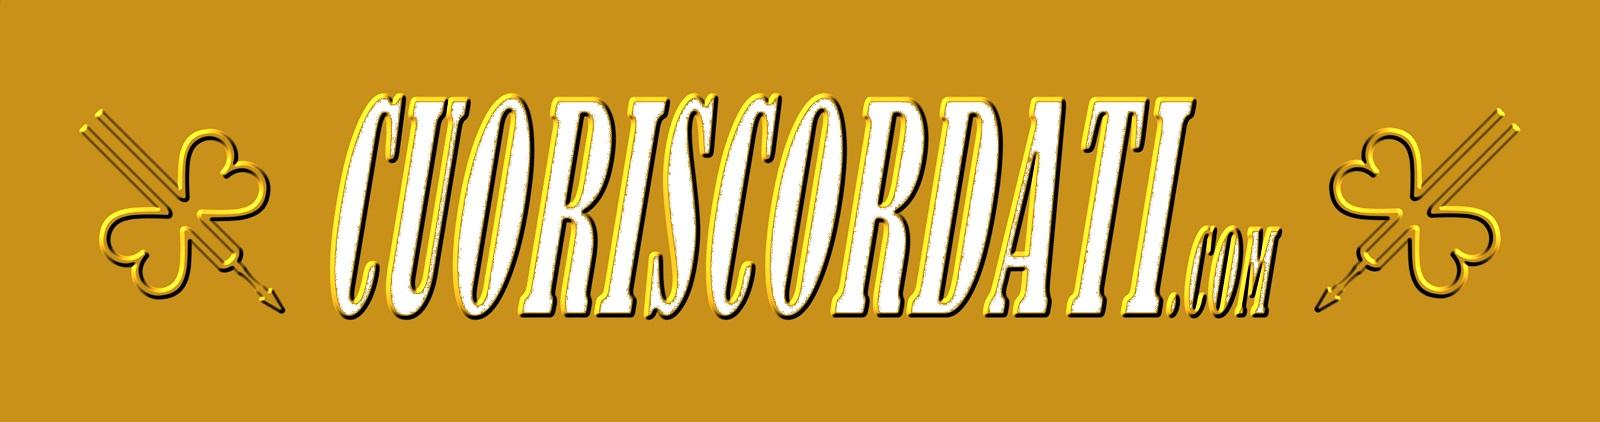 Banner Cuoriscordati.com